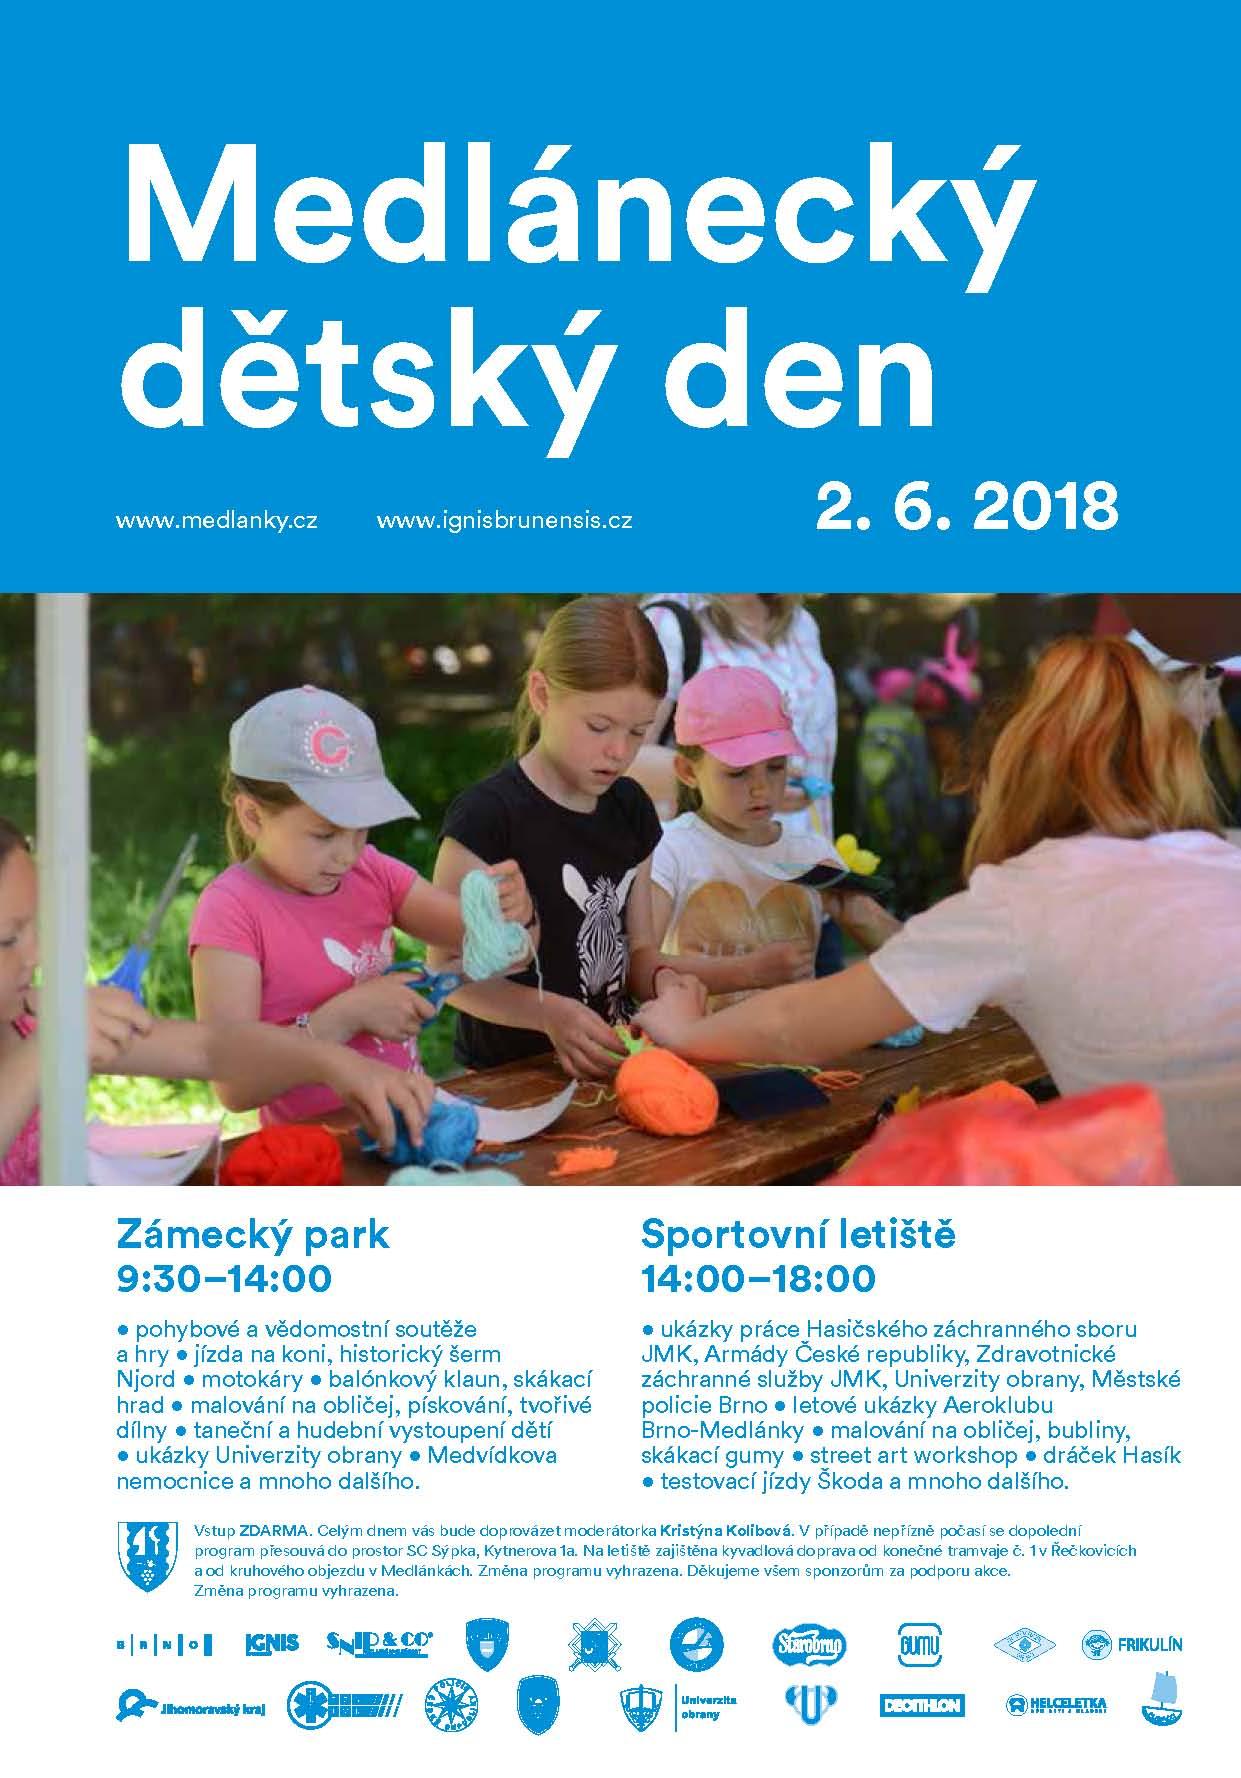 http://medlanky.cz/wp-content/uploads/2018/05/Medlanecky_den.jpg